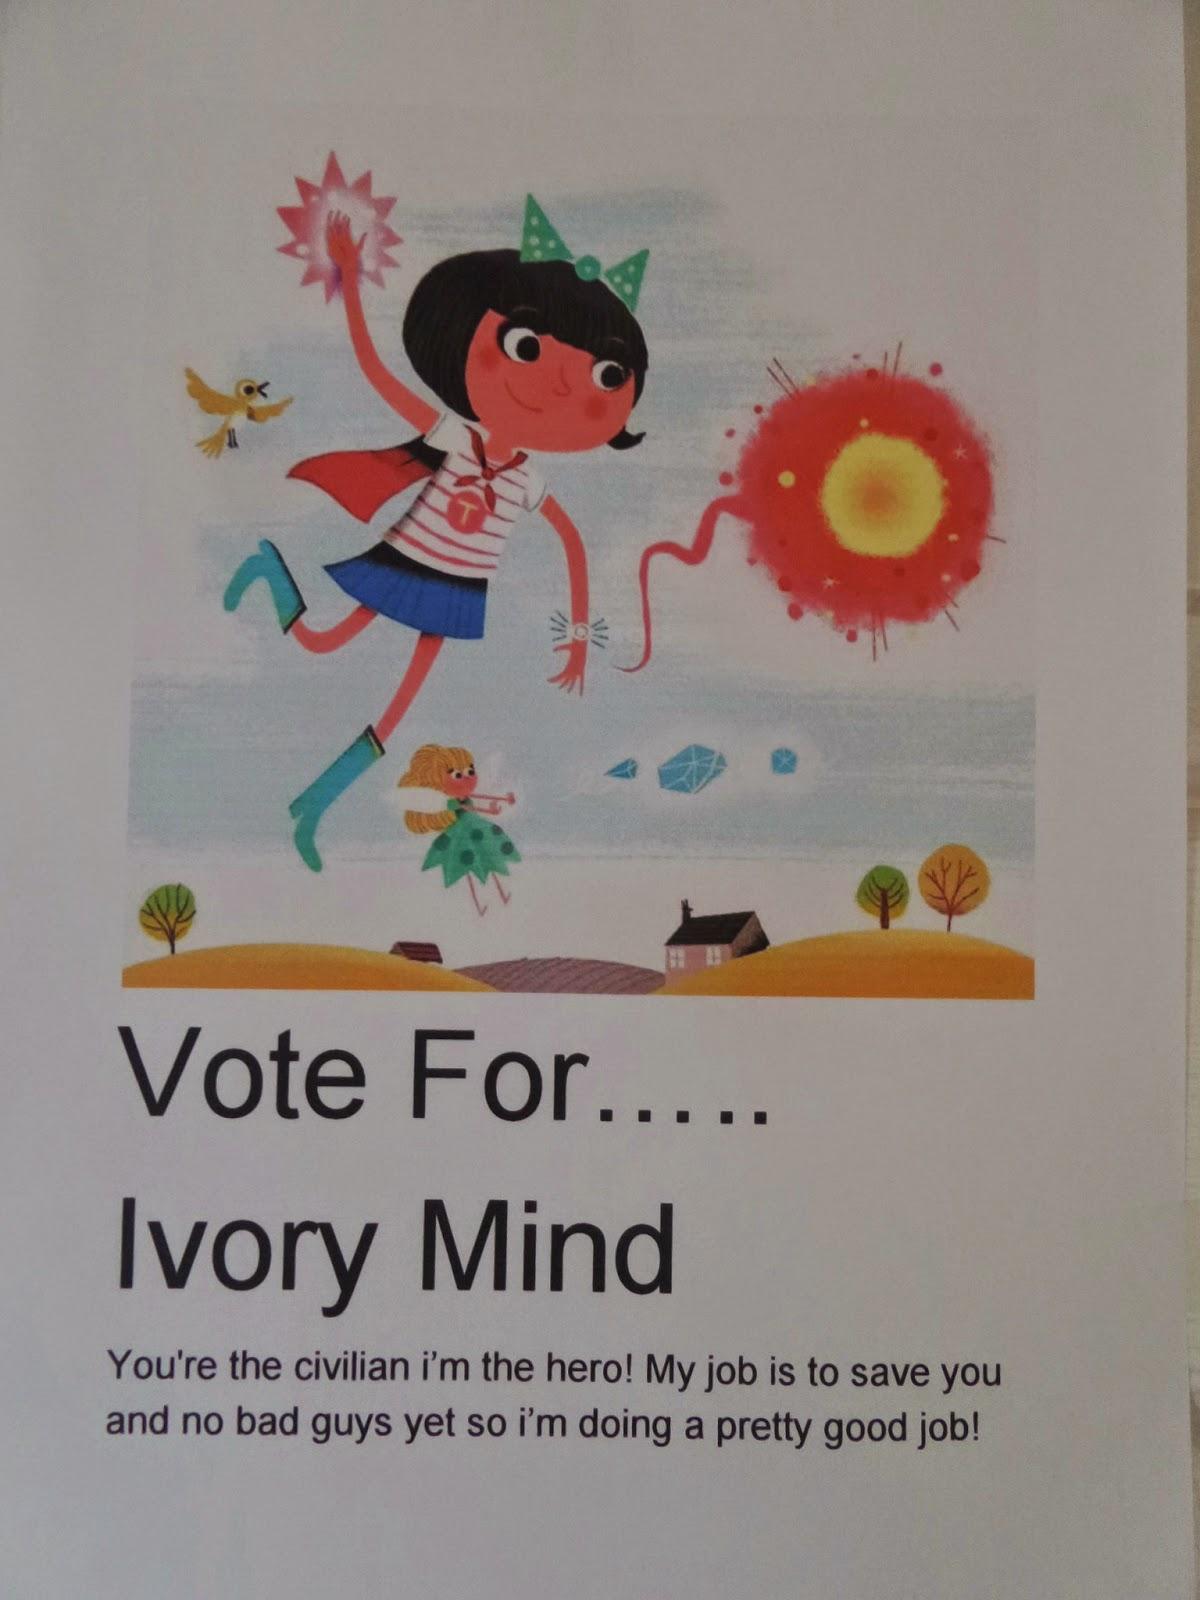 Vote For..... Ivory Mind